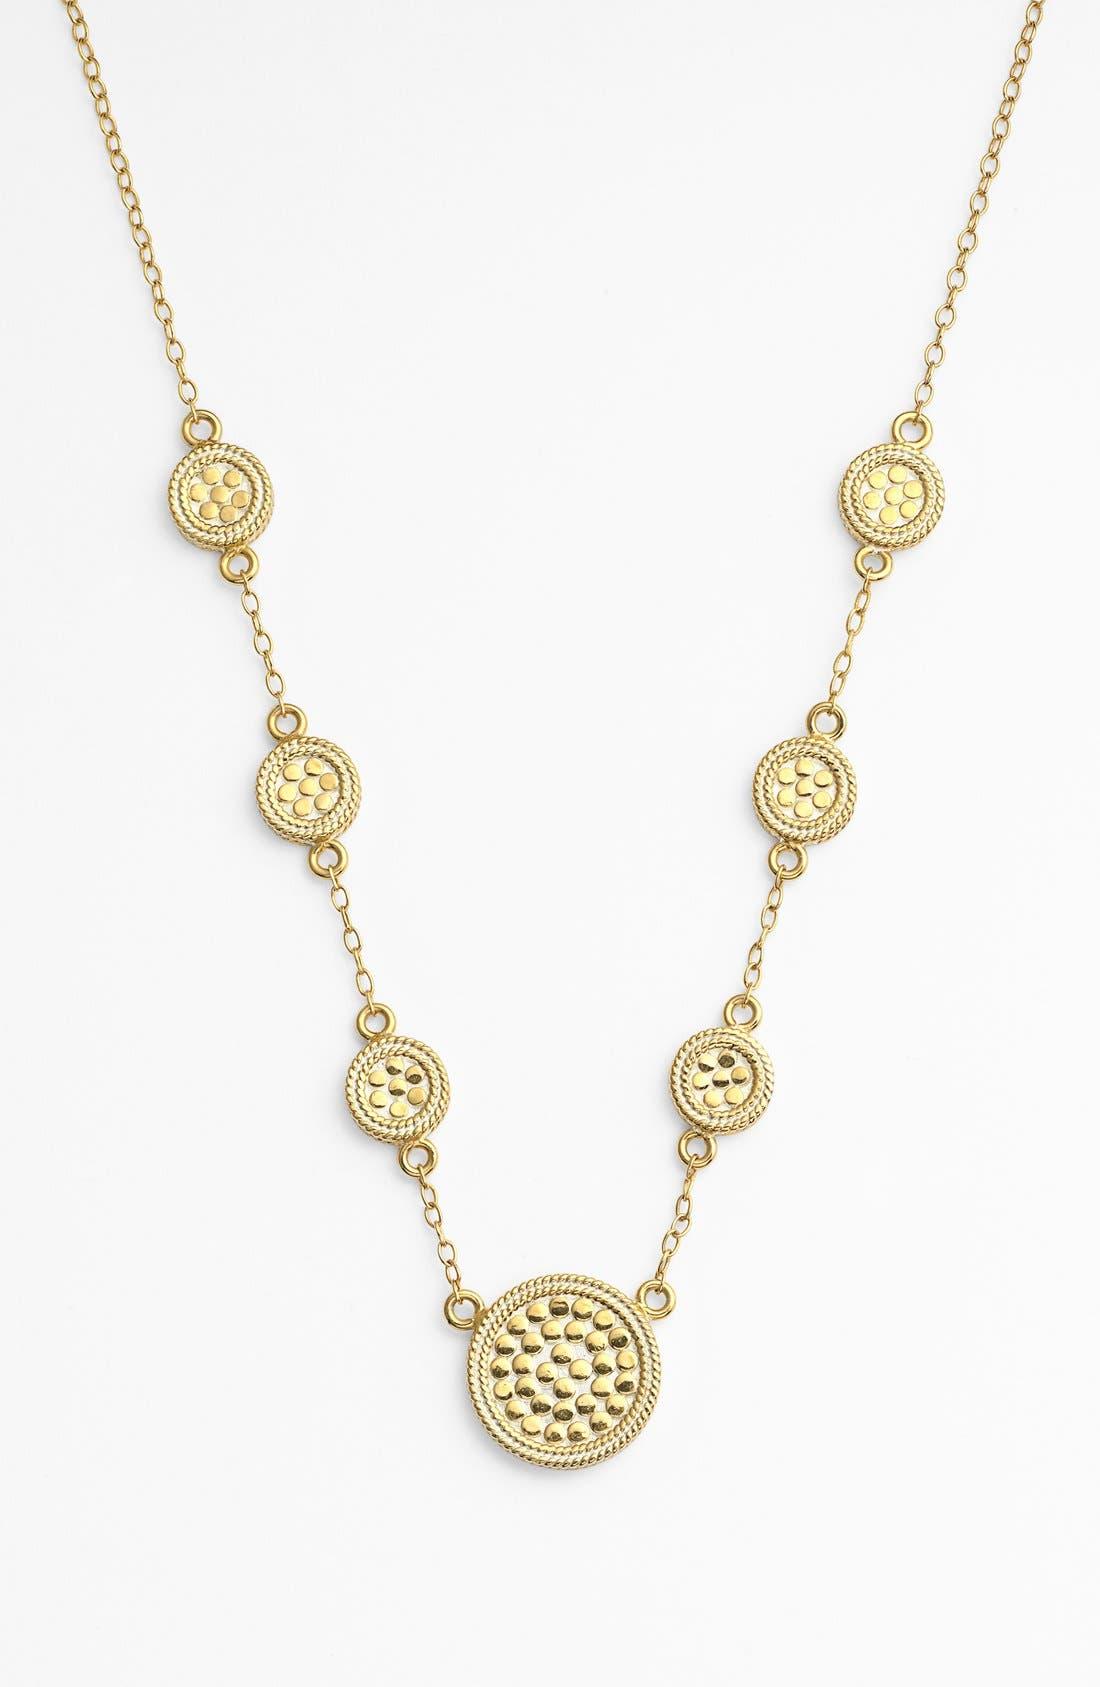 Main Image - Anna Beck 'Gili' Frontal Necklace